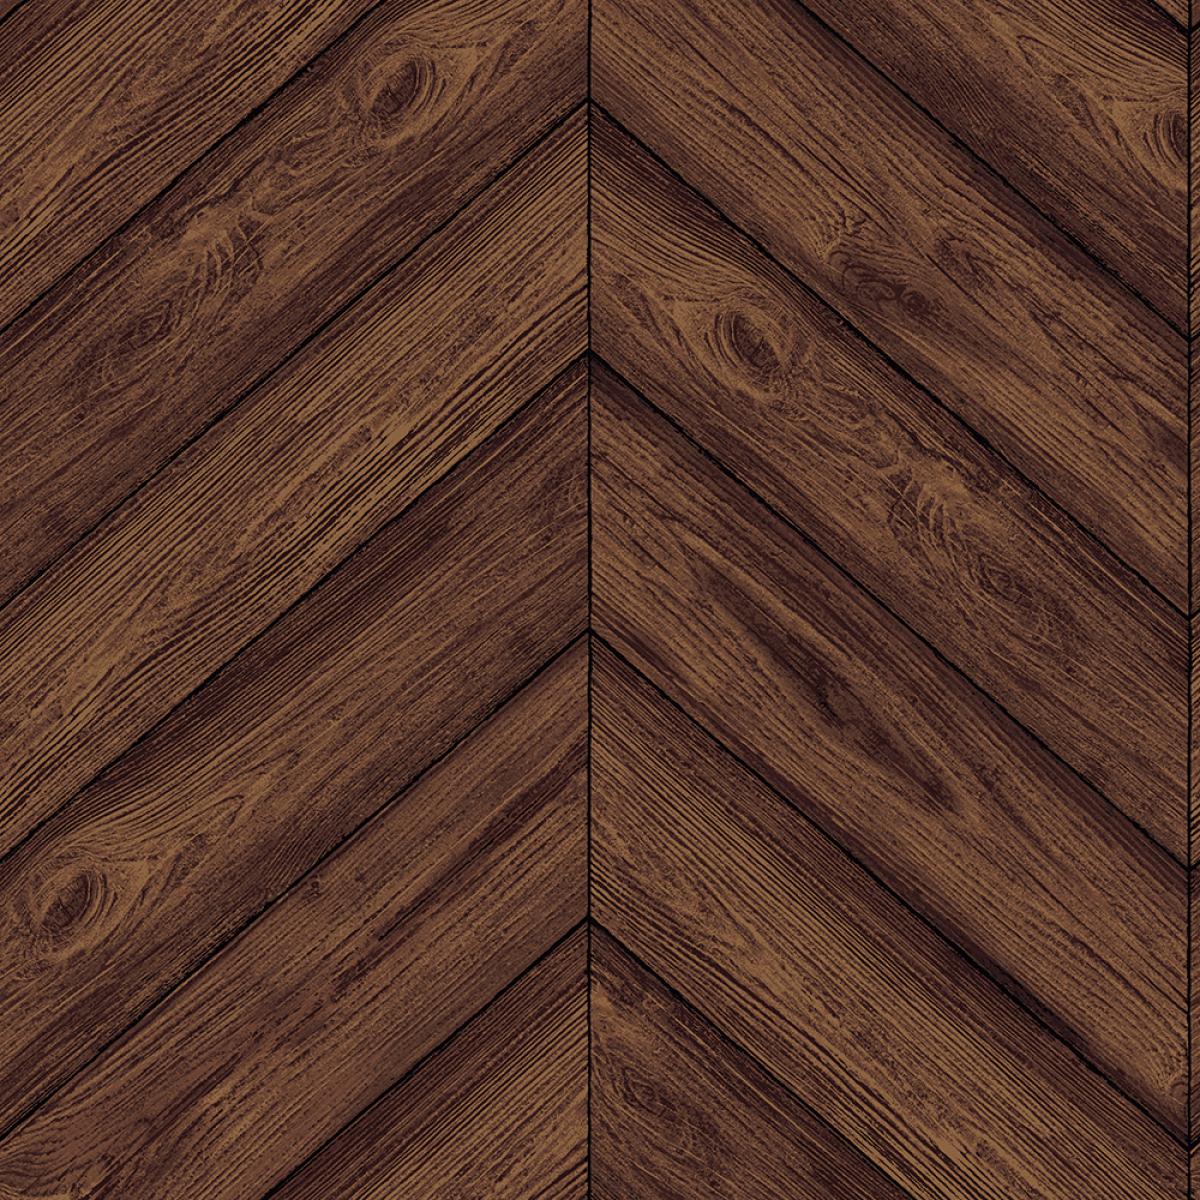 TEXTURED HERRINGBONE Walnut is from the Tempaper Textured